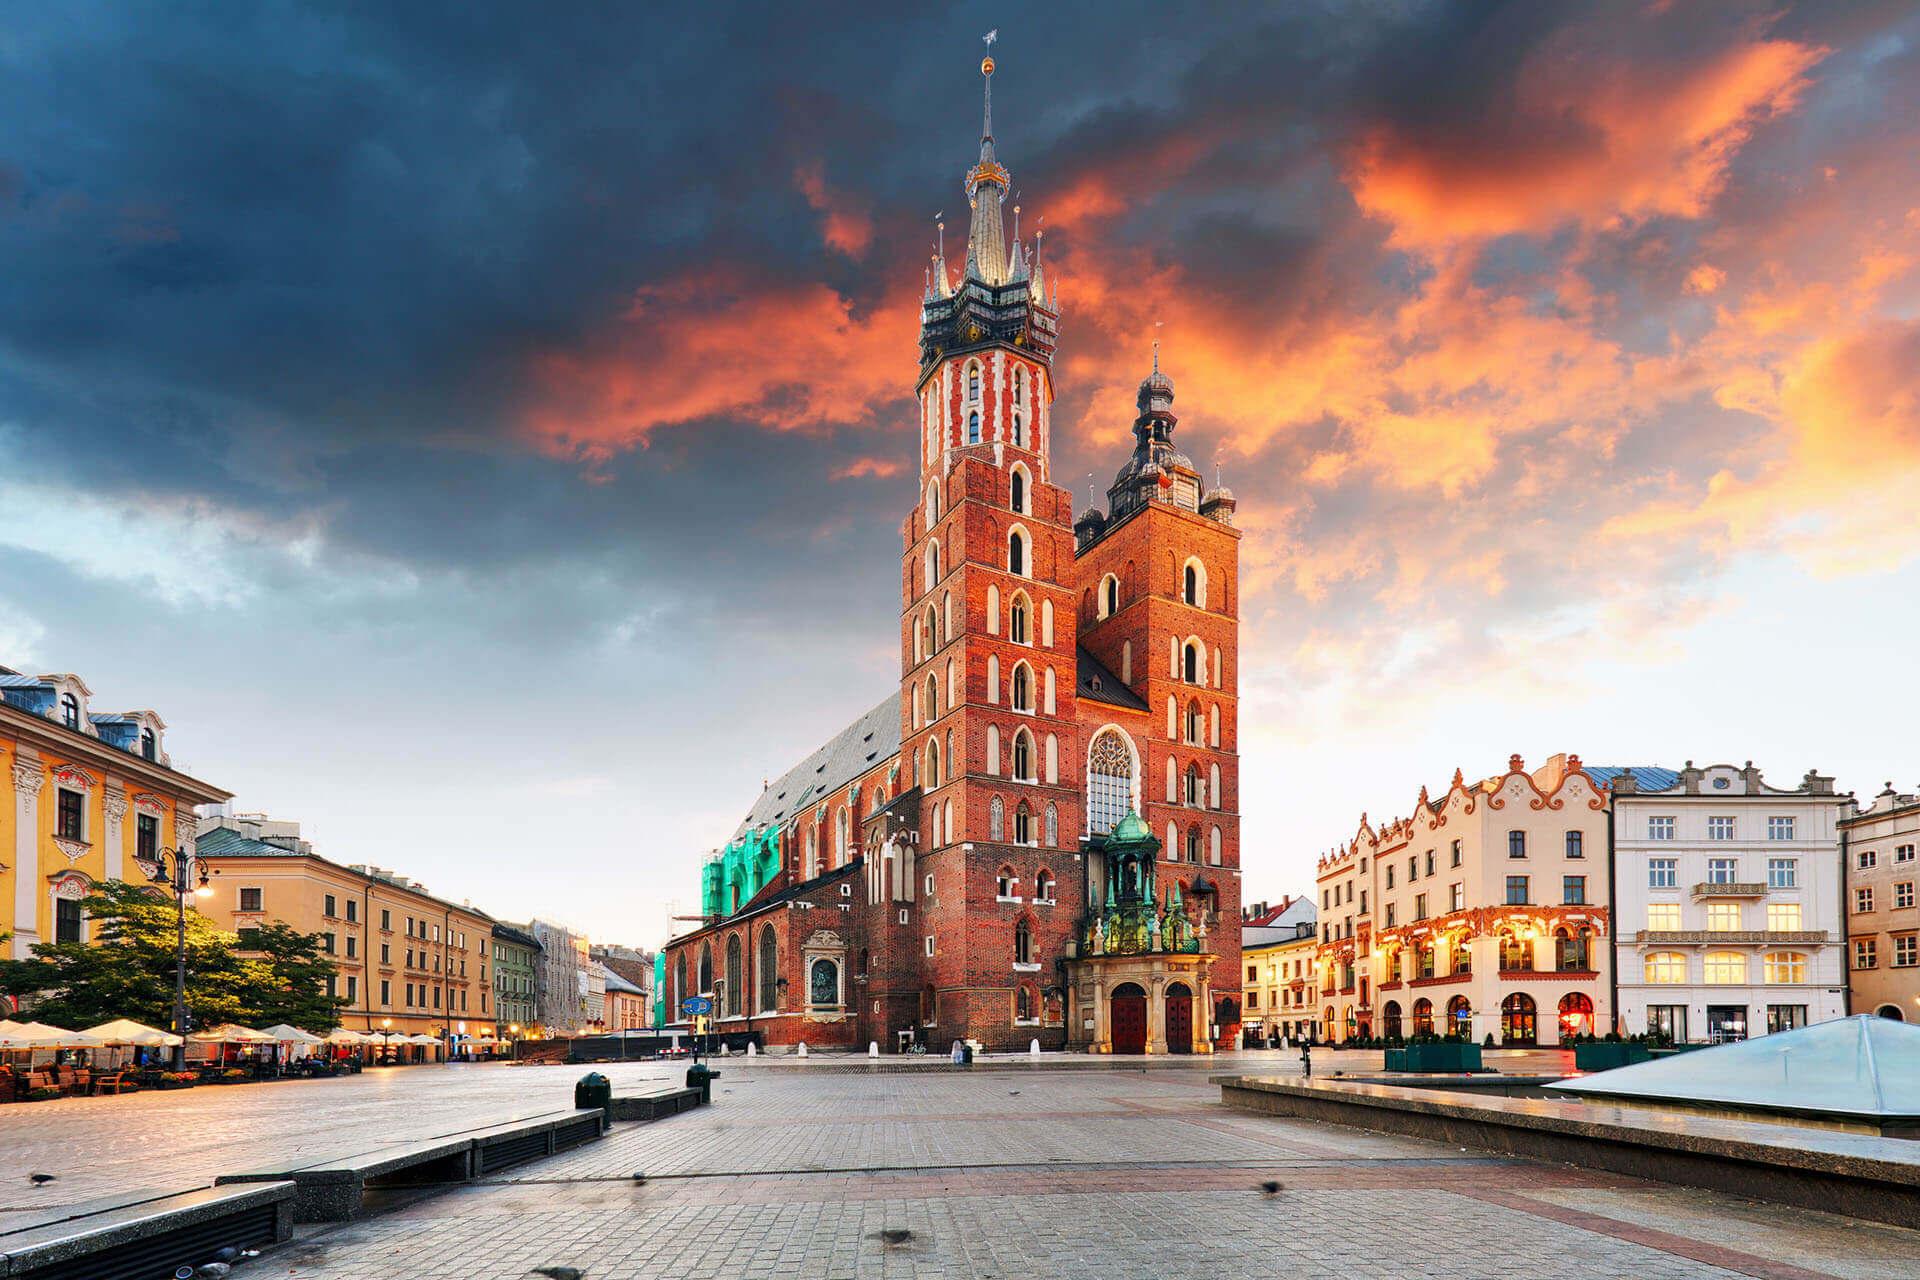 Poland: 2021 Minimum Salary Threshold Set for EU Blue Card Holders